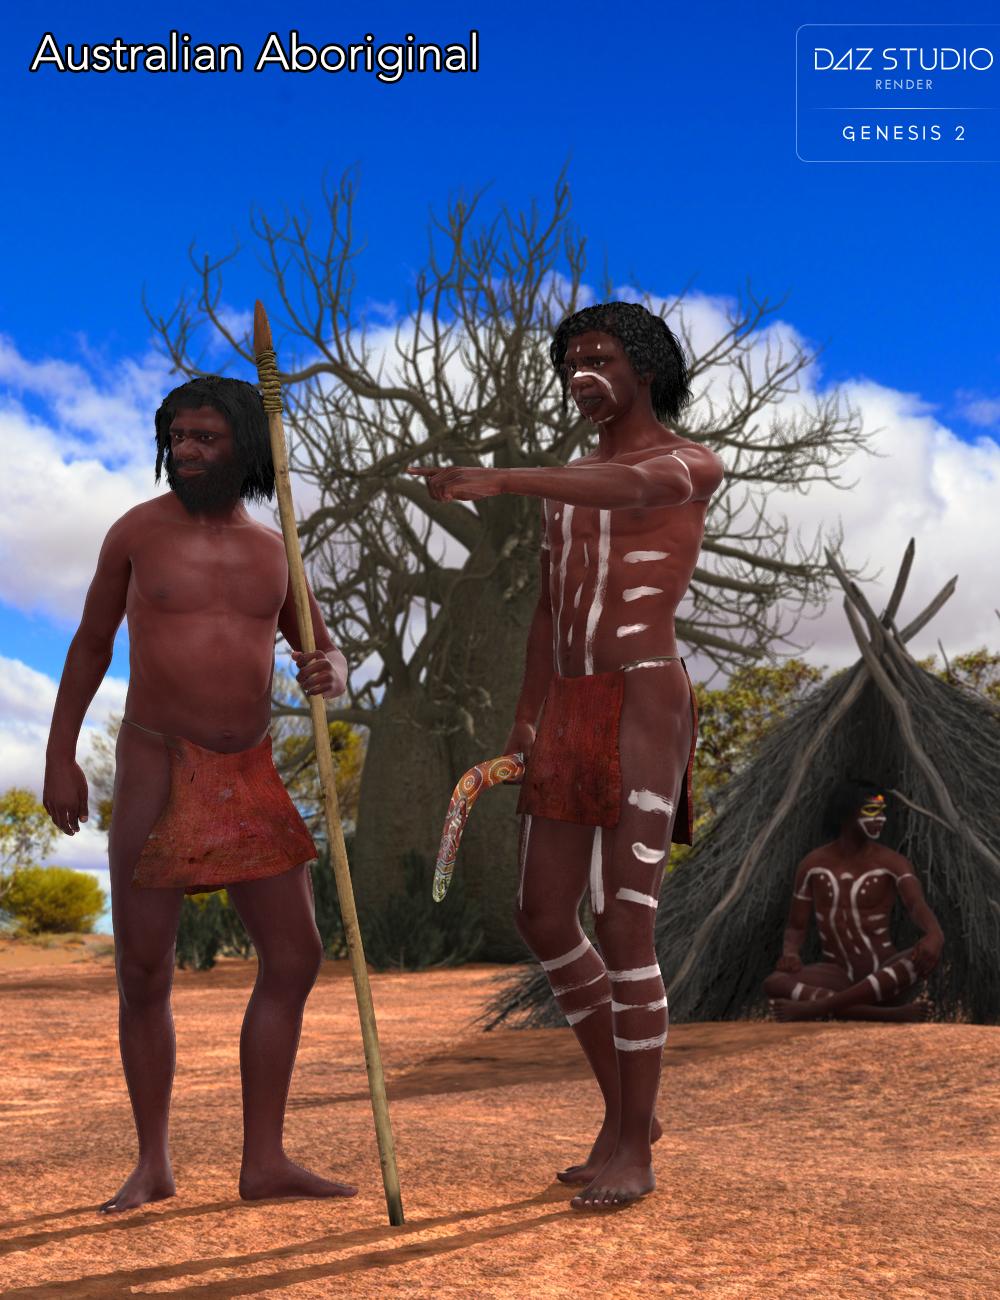 Gurumarra, the Australian Aboriginal by: Alessandro_AMLMX3D, 3D Models by Daz 3D